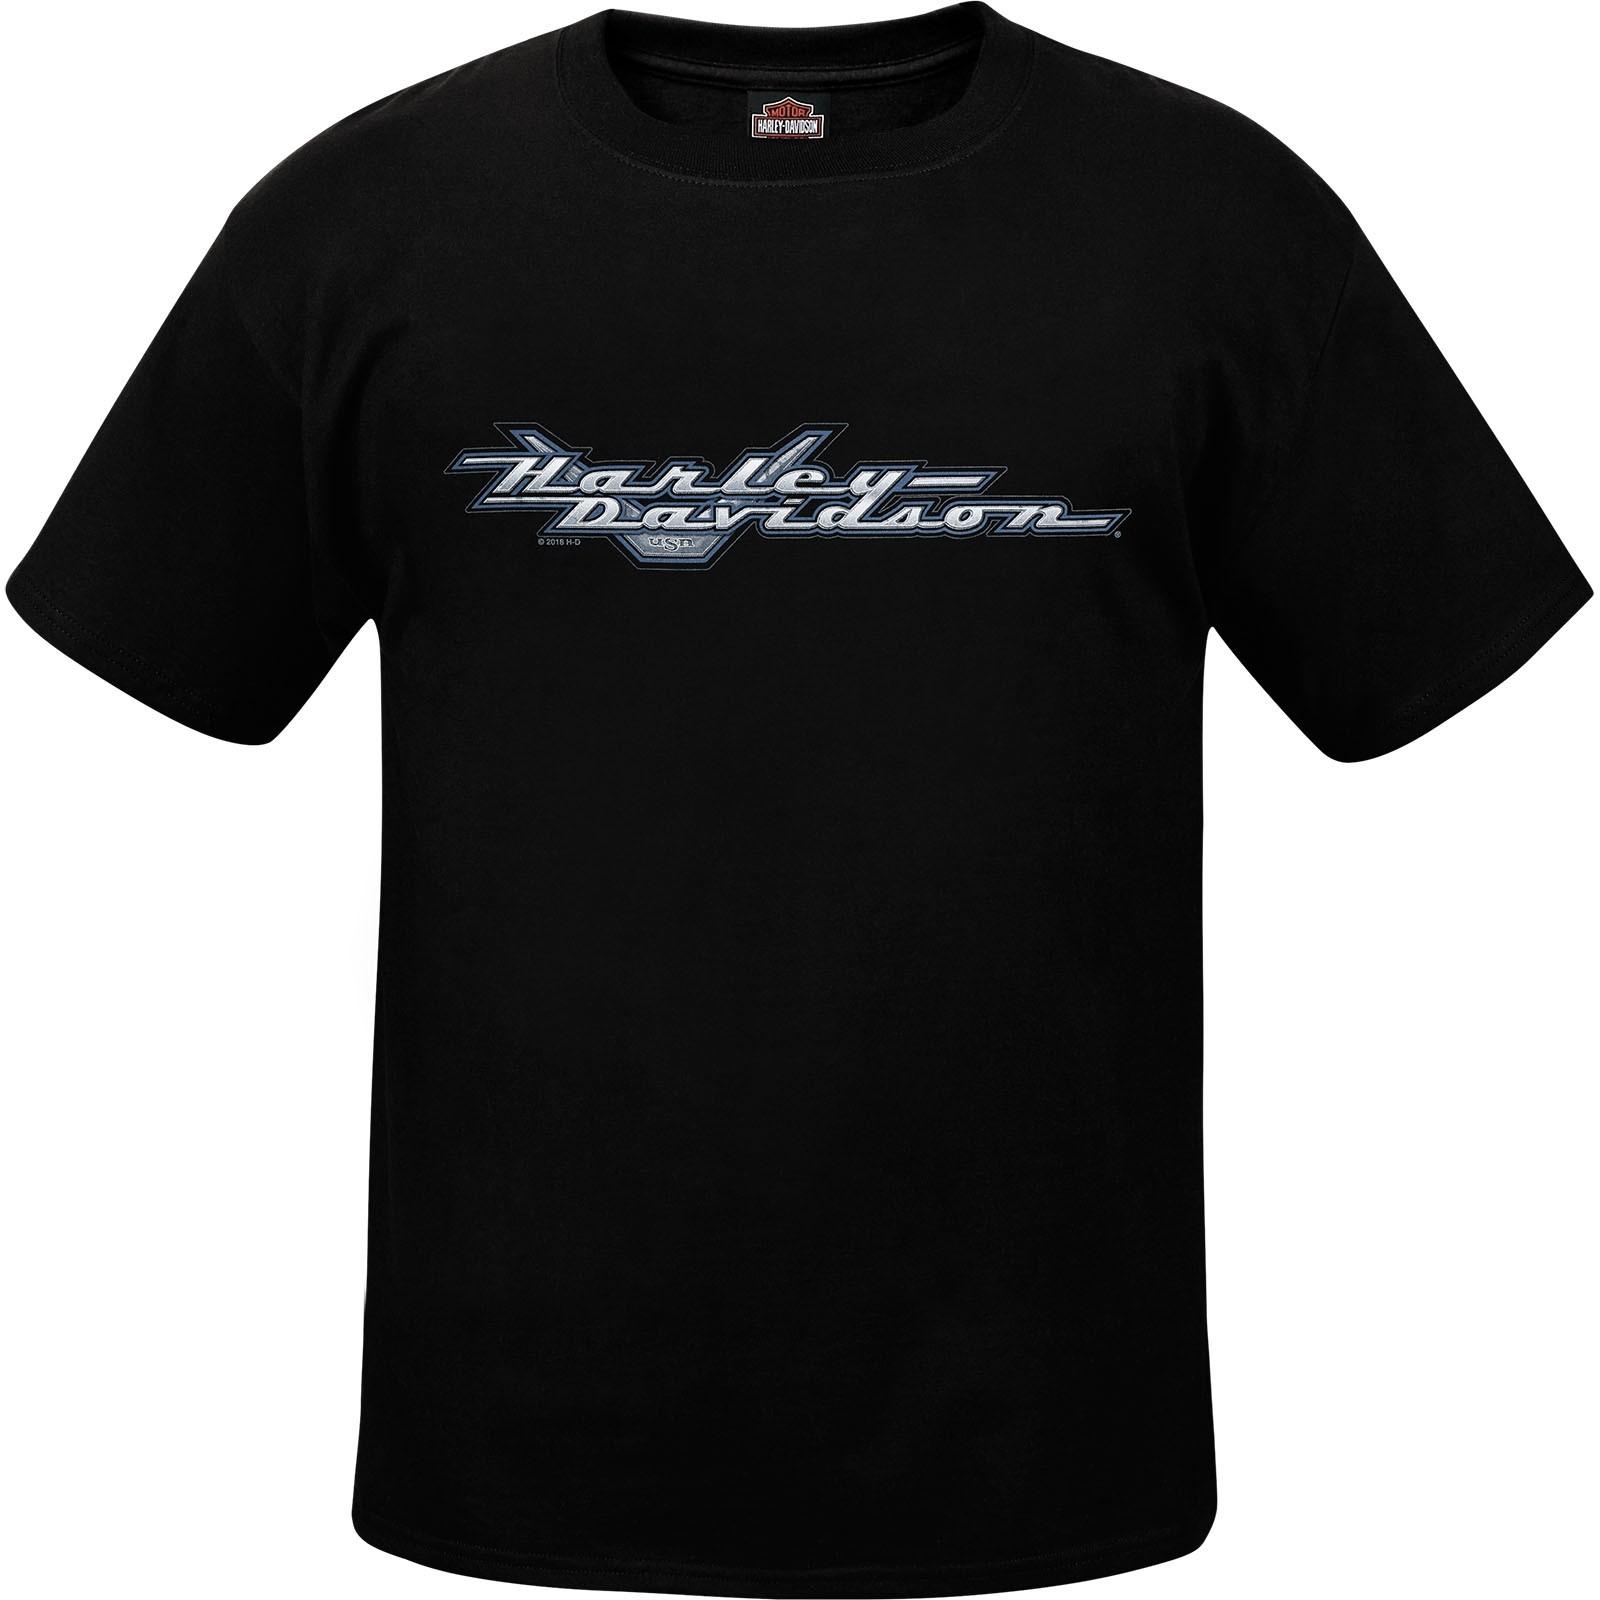 Harley-Davidson Men's Short-Sleeve Tee - Yokosuka | Road Logo